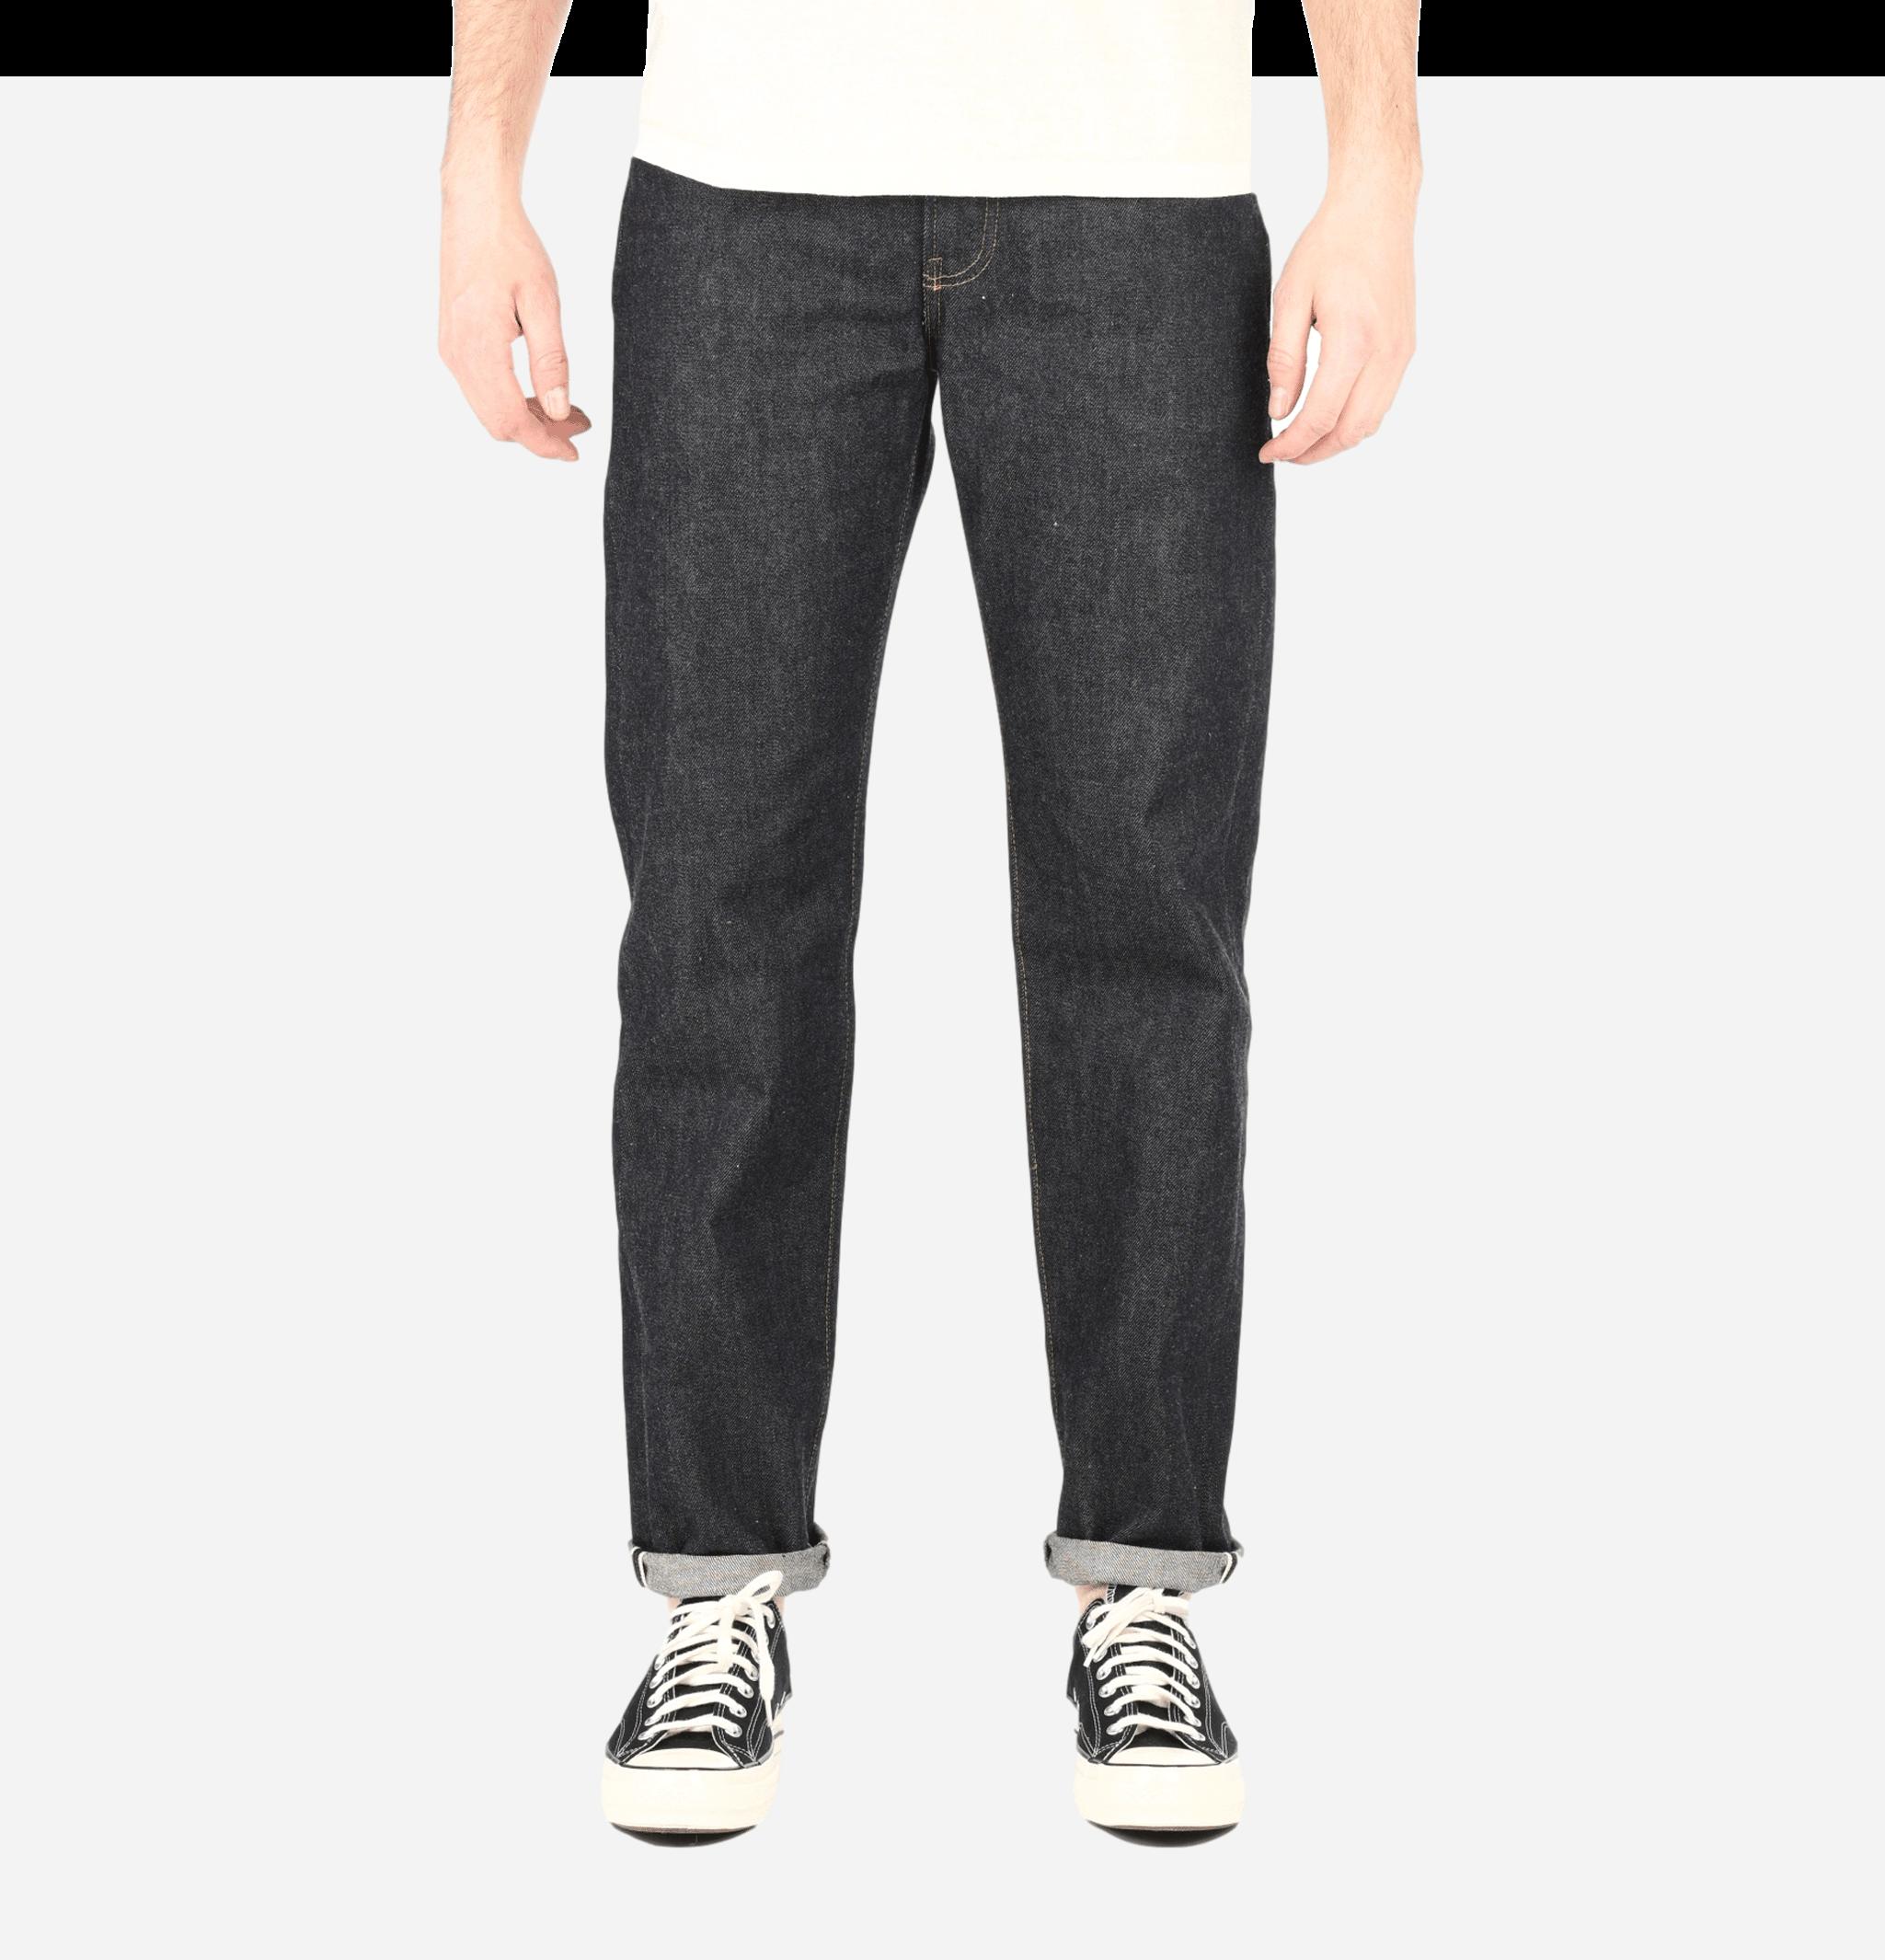 501® 1954 Jeans Rigid